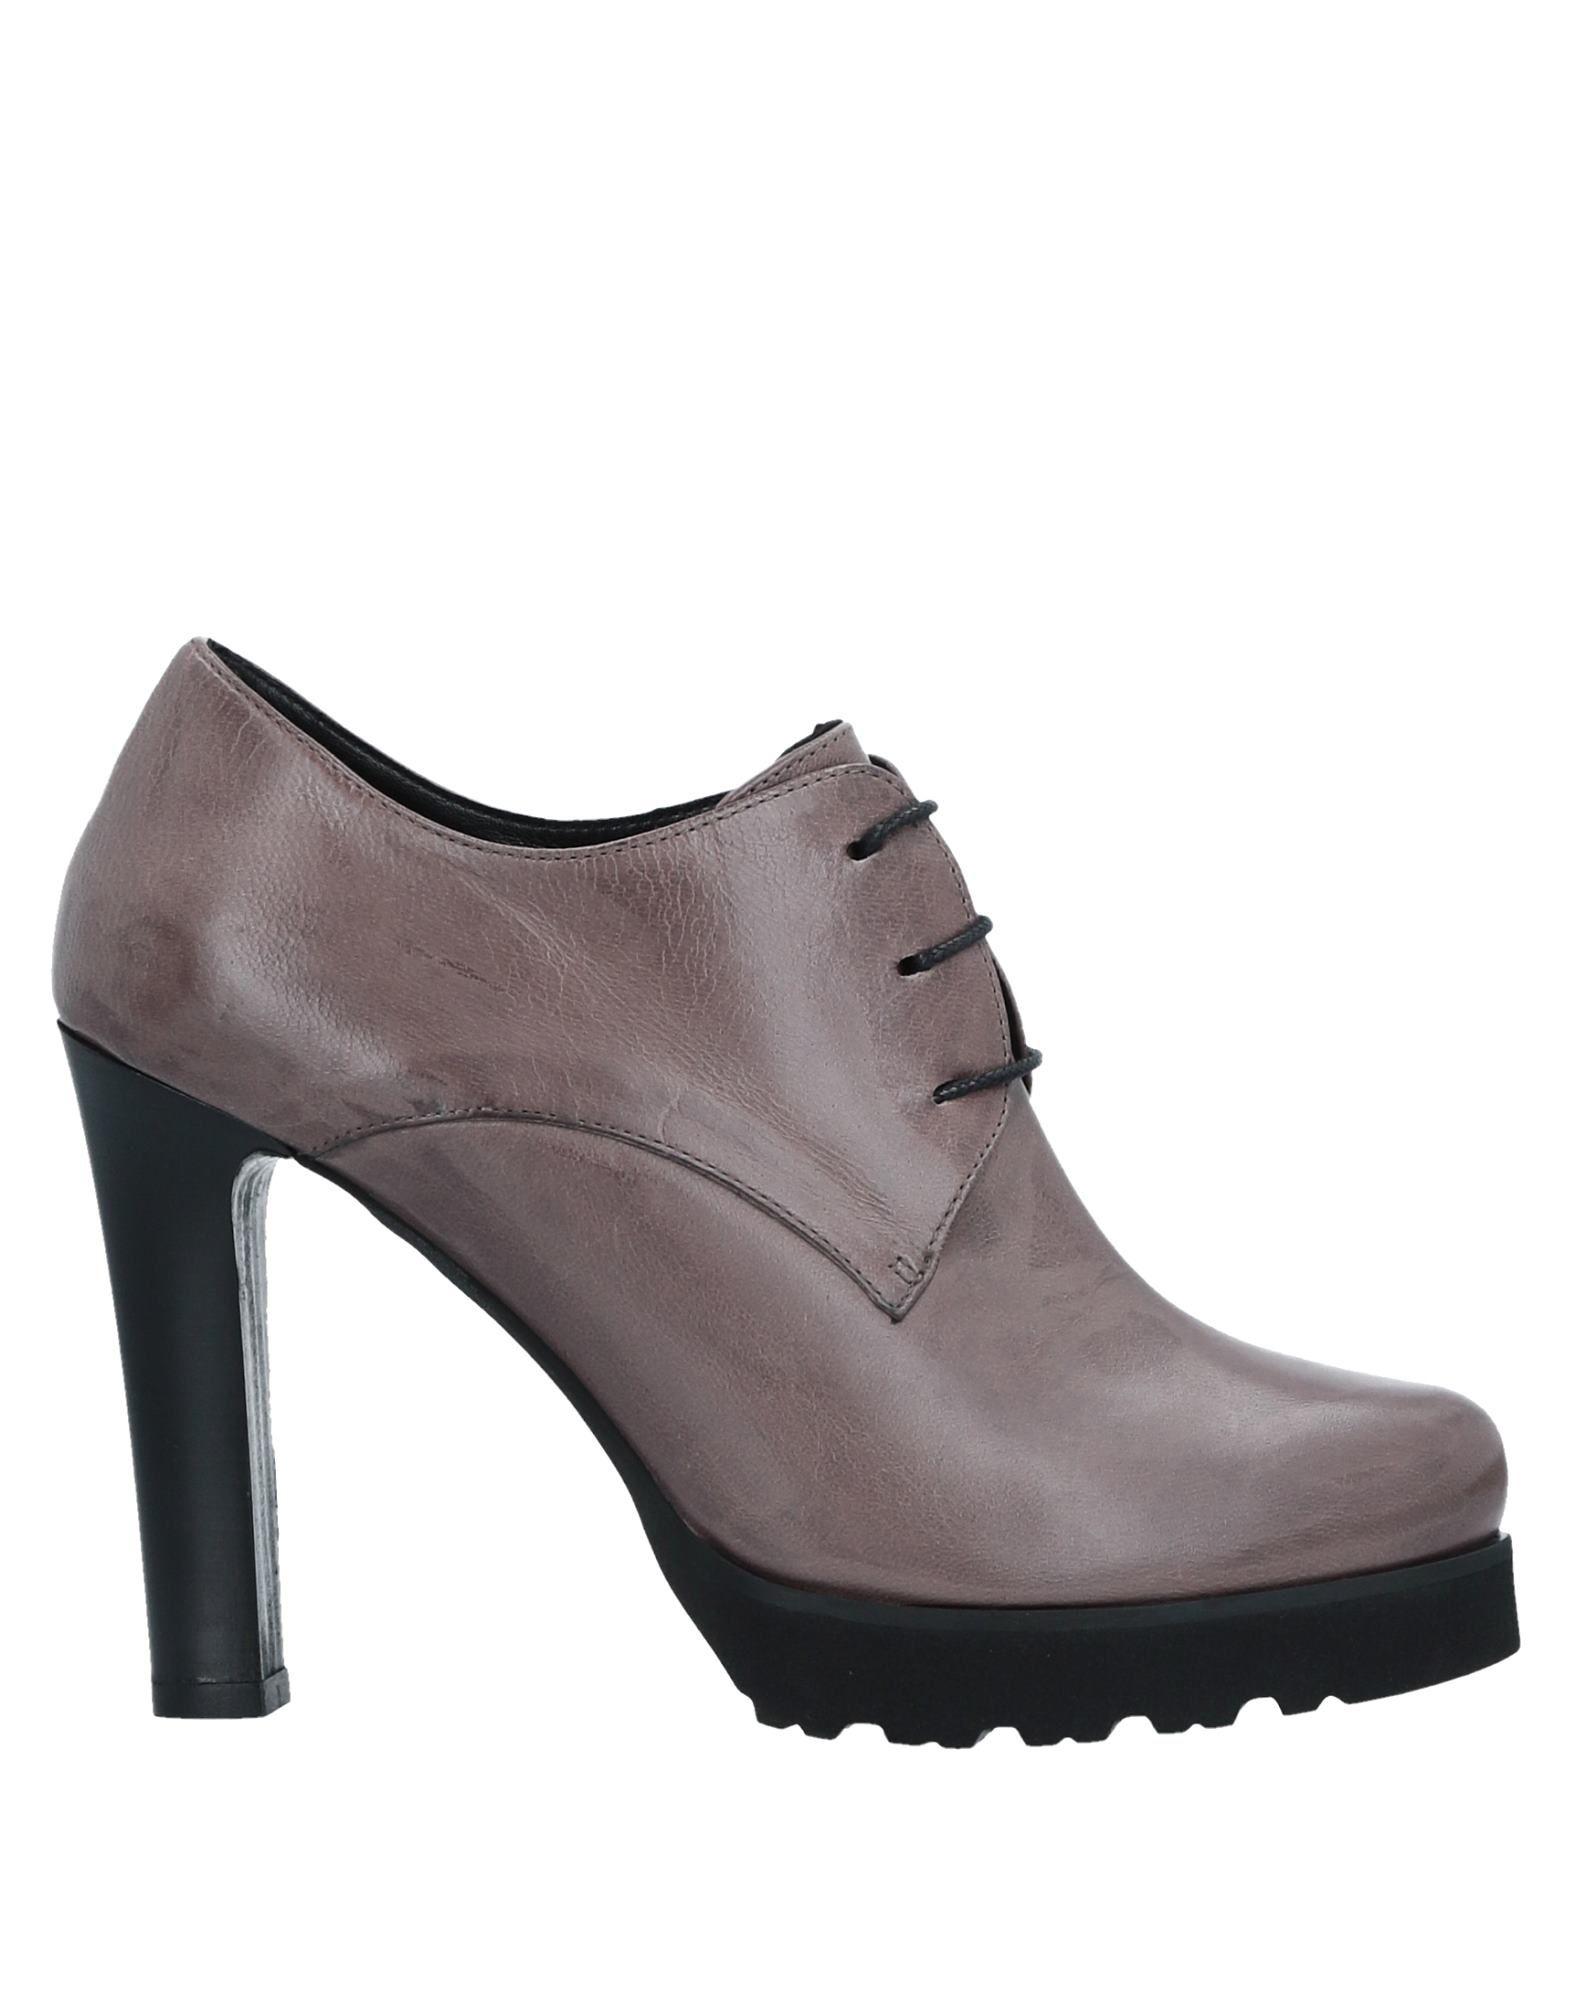 Bactá Dei Toi Schnürschuhe Damen  11518886AK Gute Qualität beliebte Schuhe